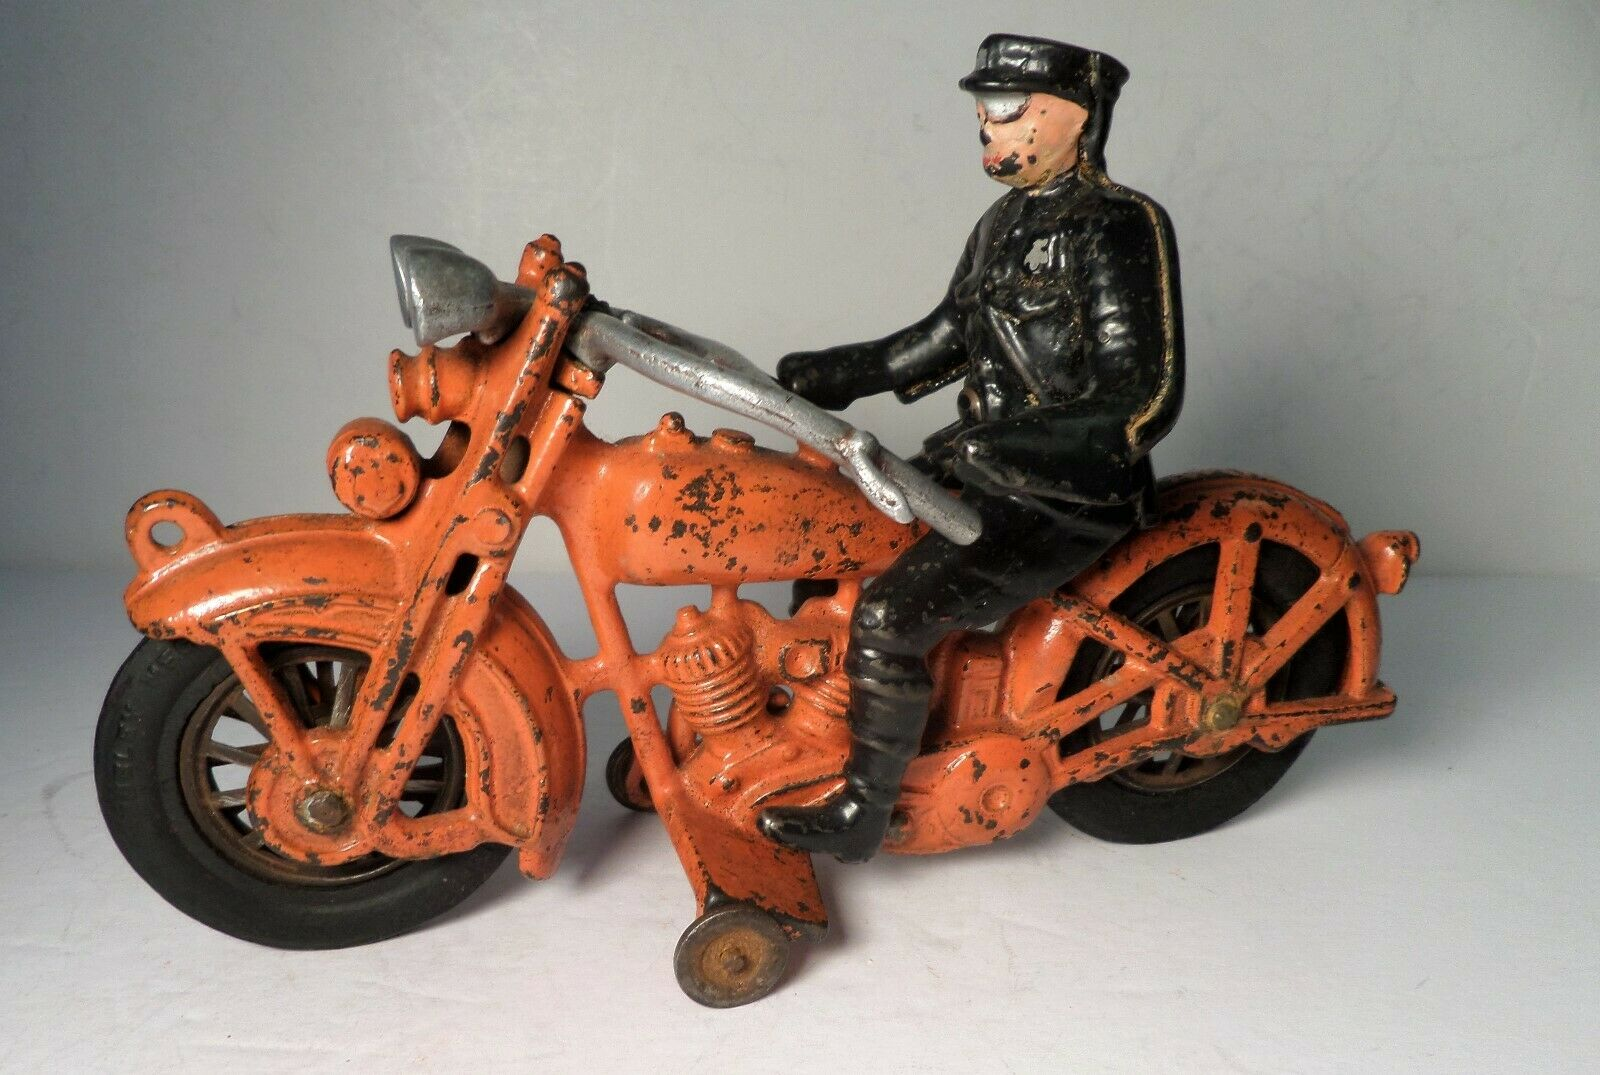 Década de 1930 Hubley Harley Davidson Solo Naranja Motocicleta con Rider 9